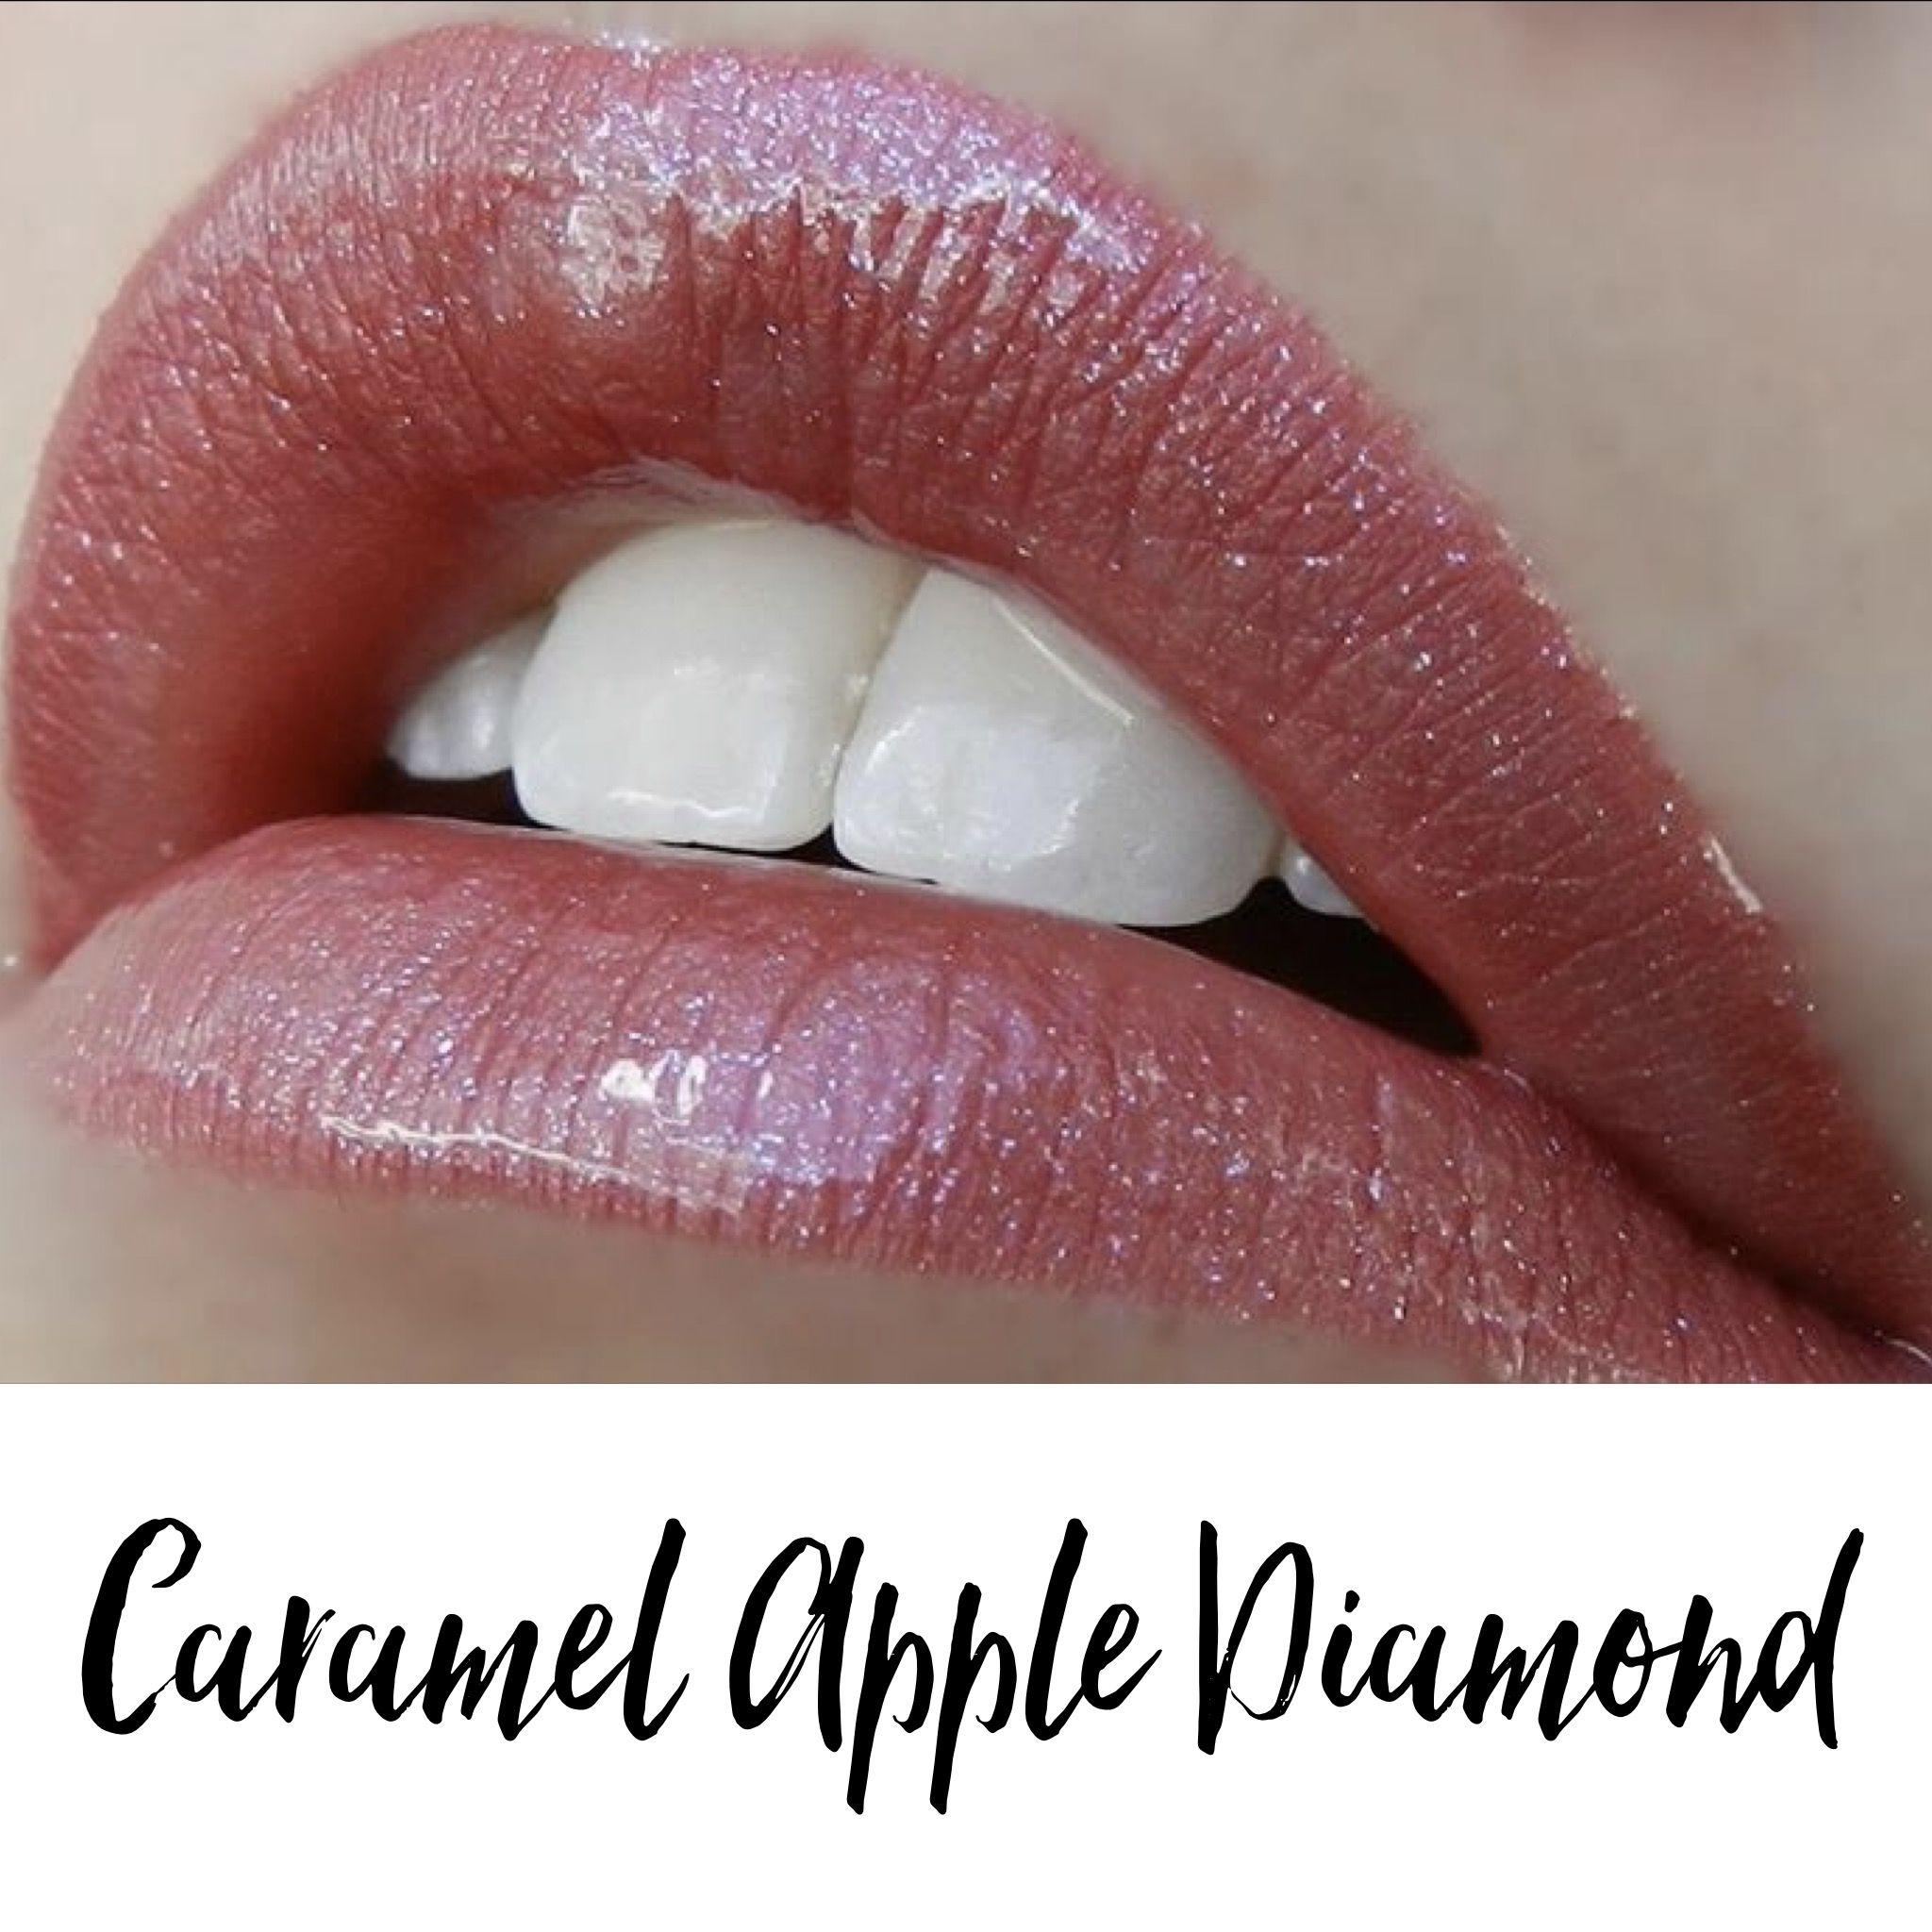 Caramel Apple Diamond LipSense with Diamond Kiss Gloss